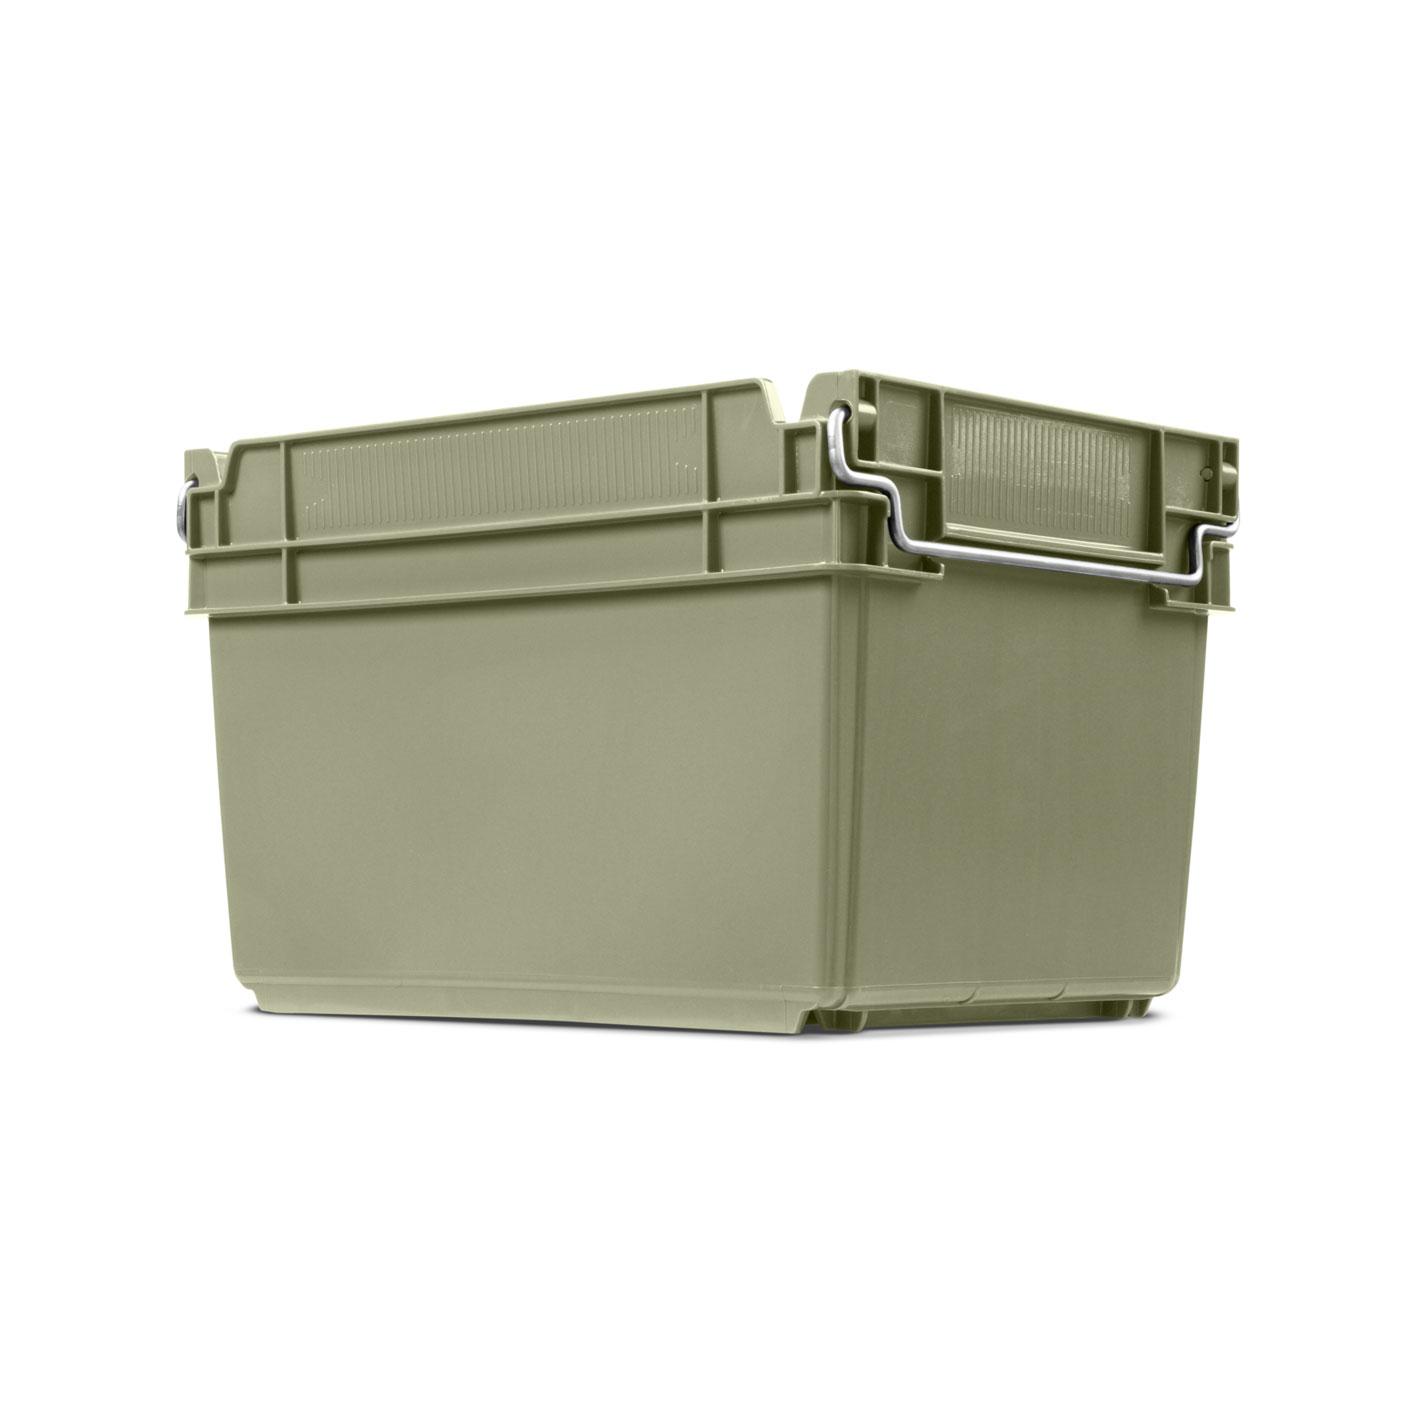 22 litre swingbar crate